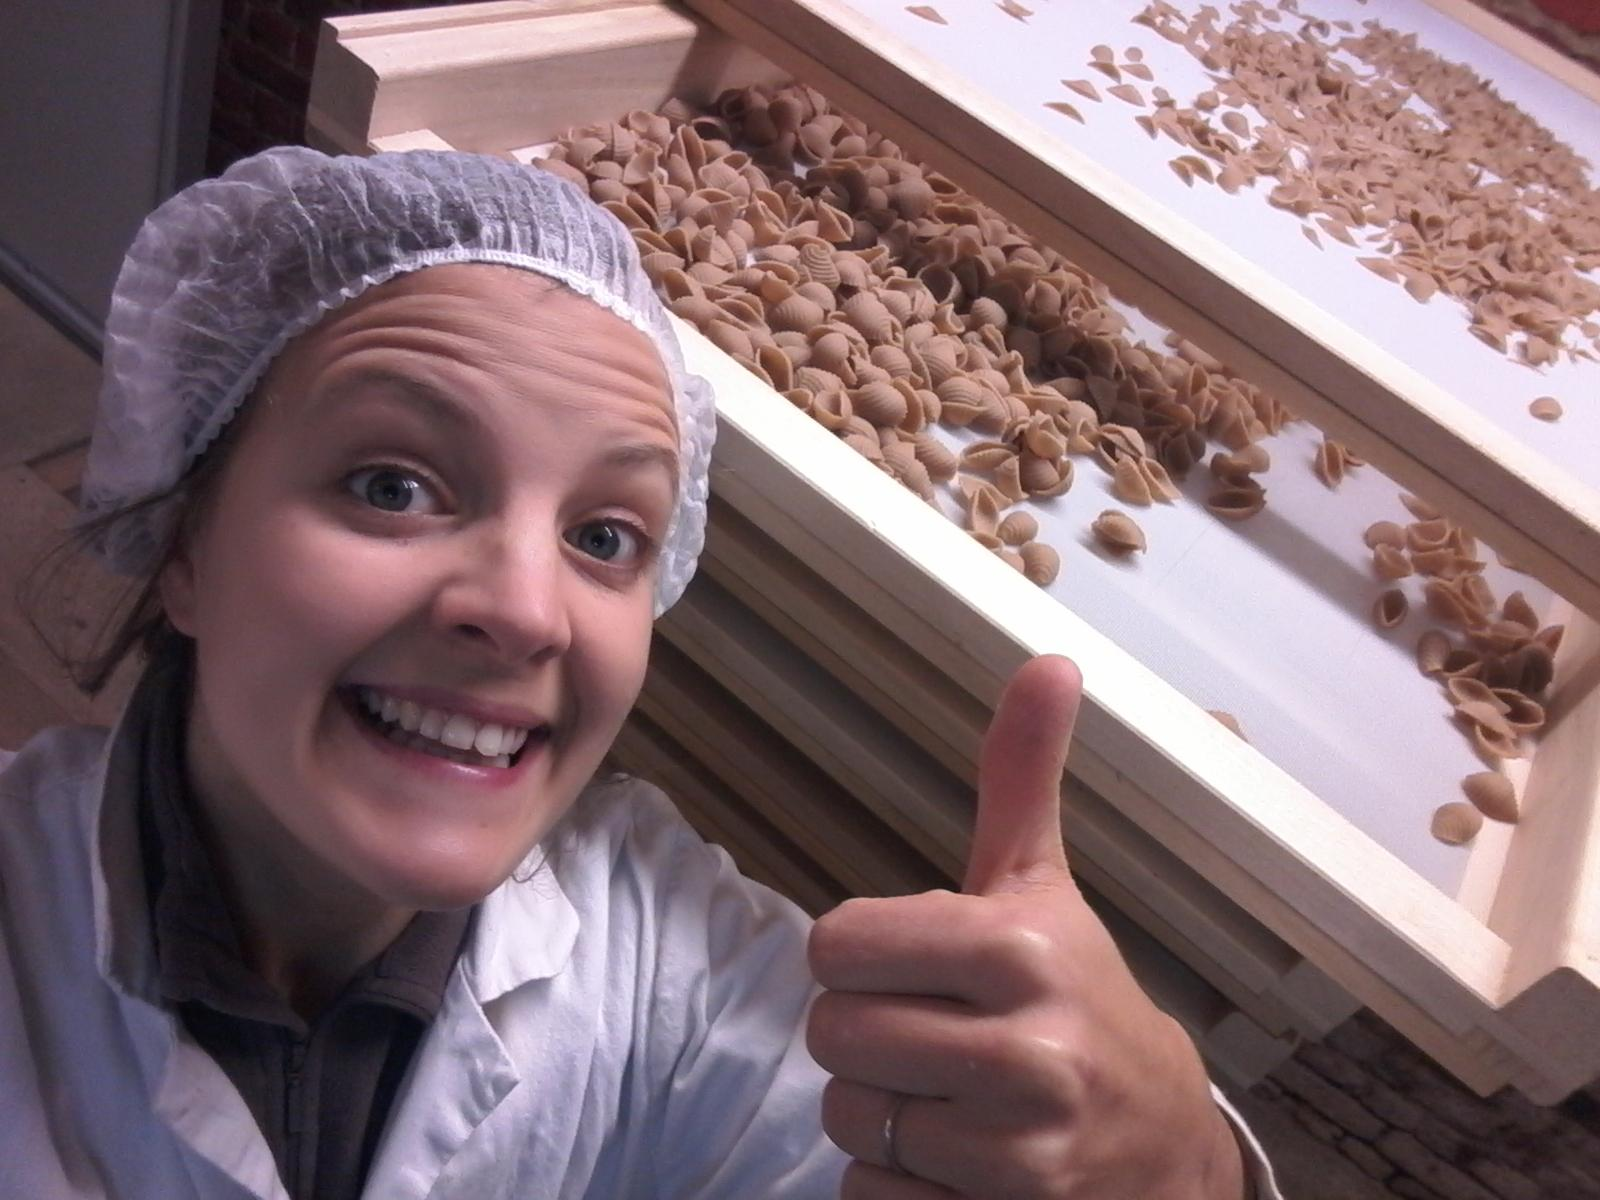 fabrication de pâtes sèches